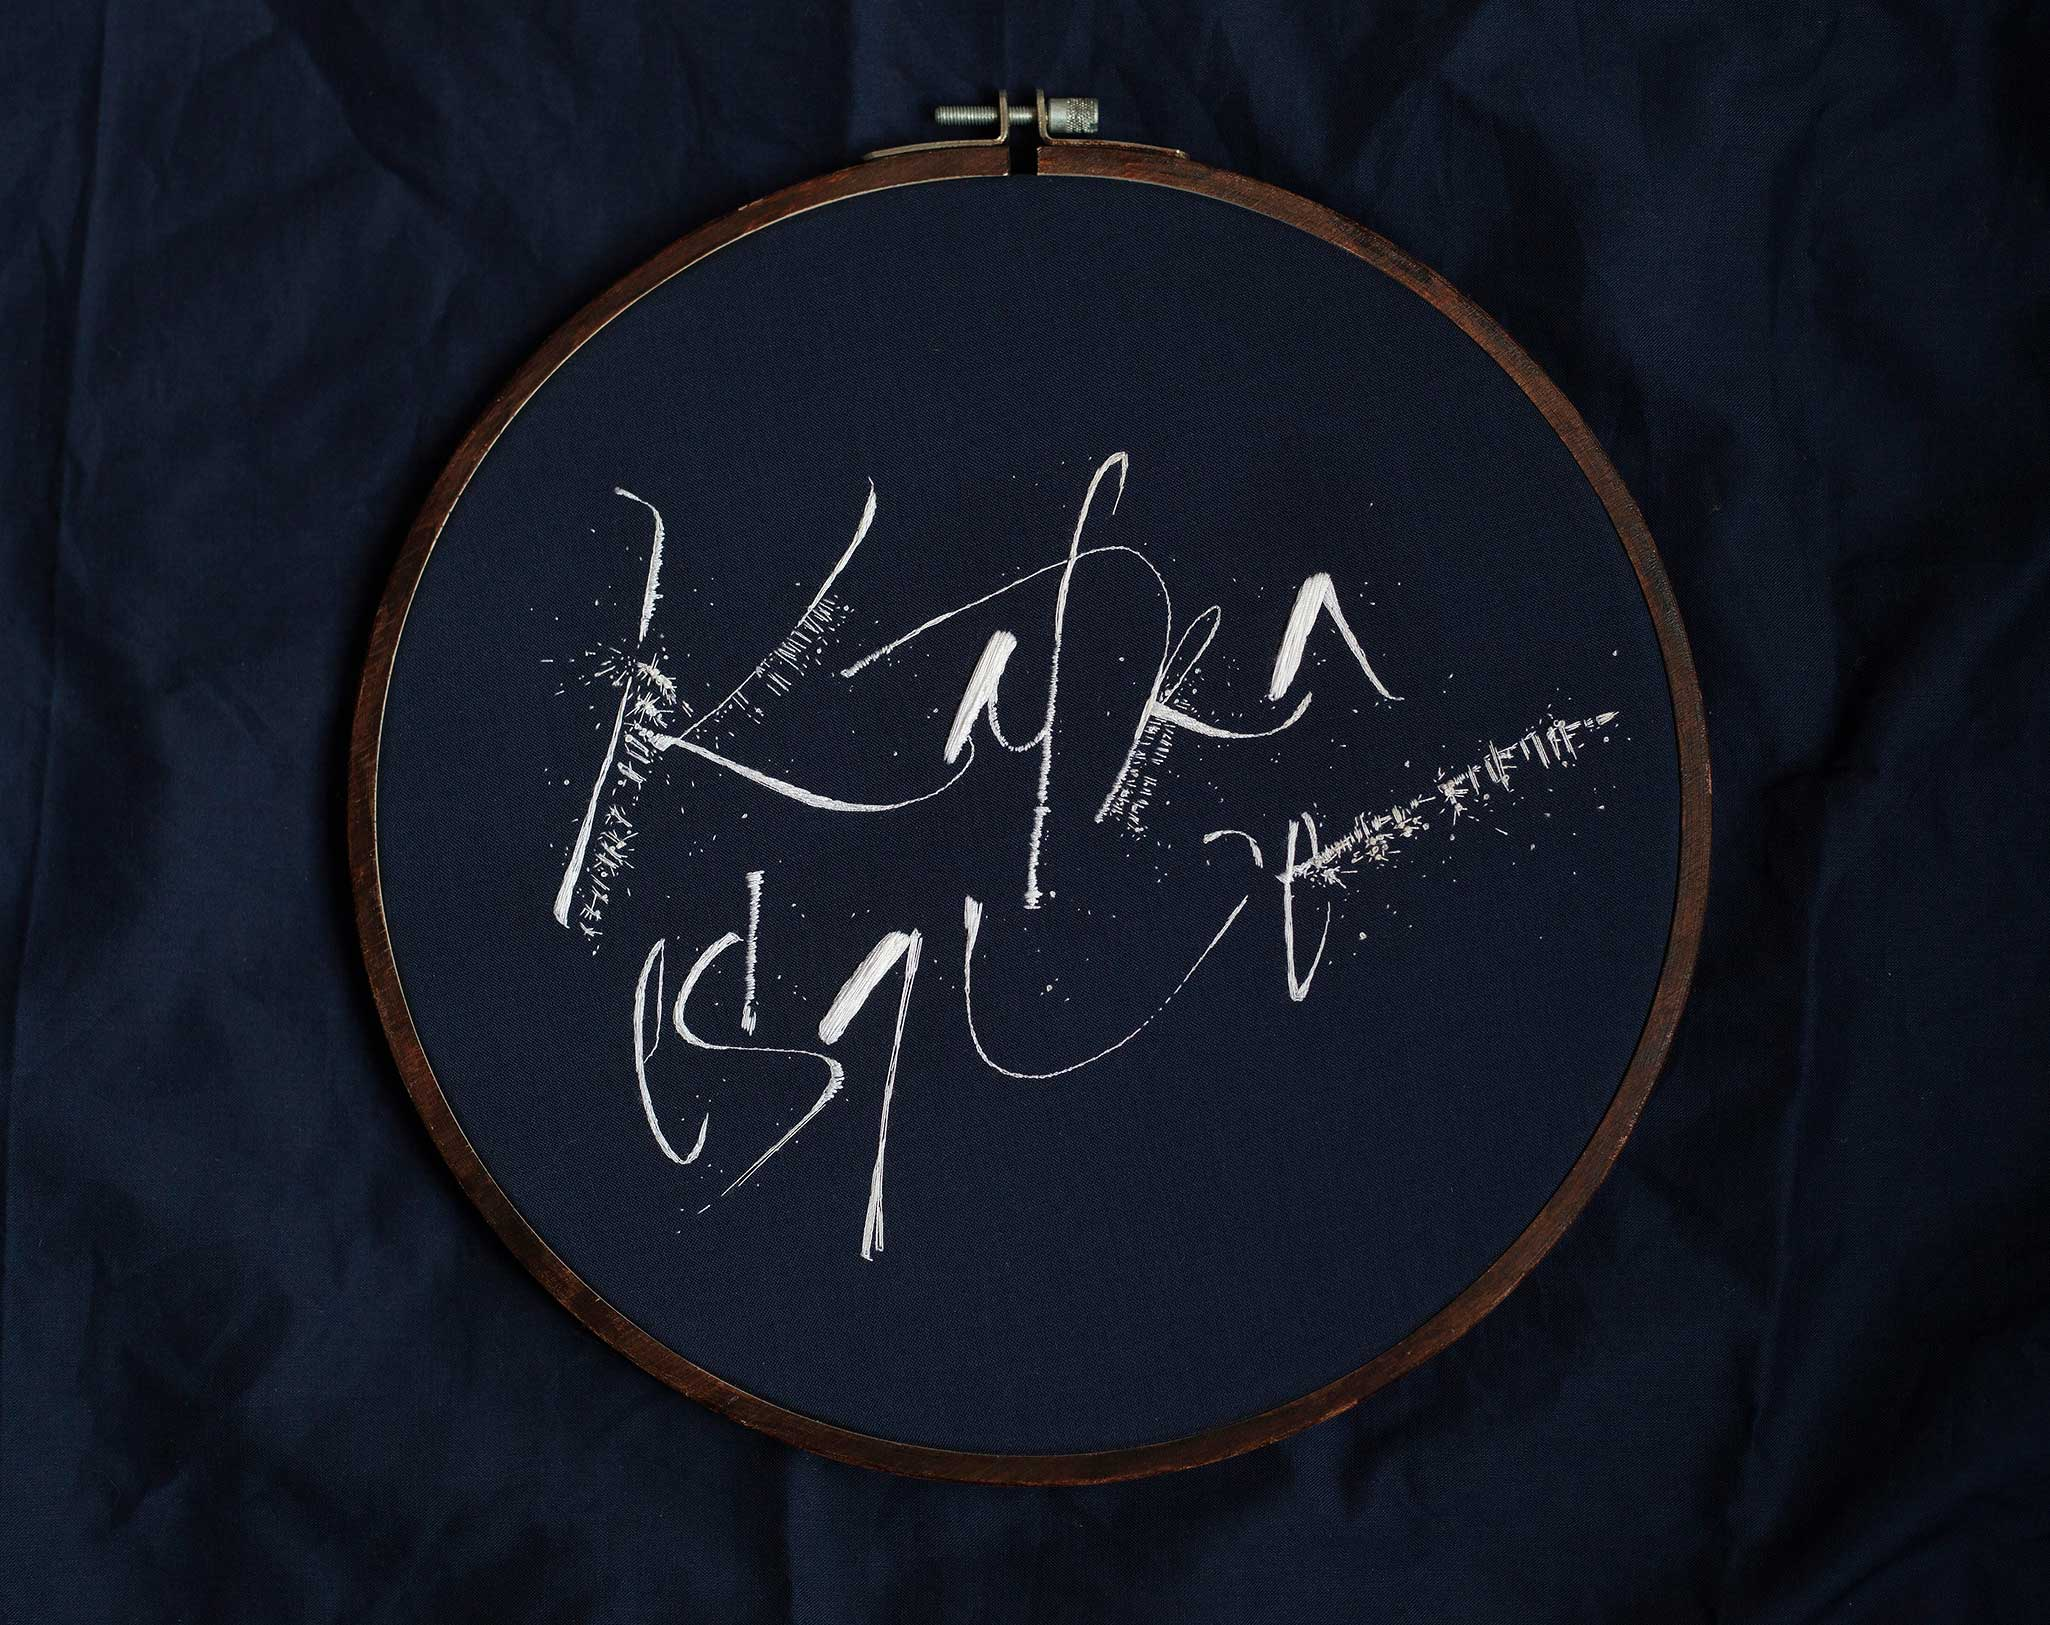 Gestickte Kalligrafie von Olga Kovalenko Gestickte-Kalligrafie-von-Olga-Kovalenko_01